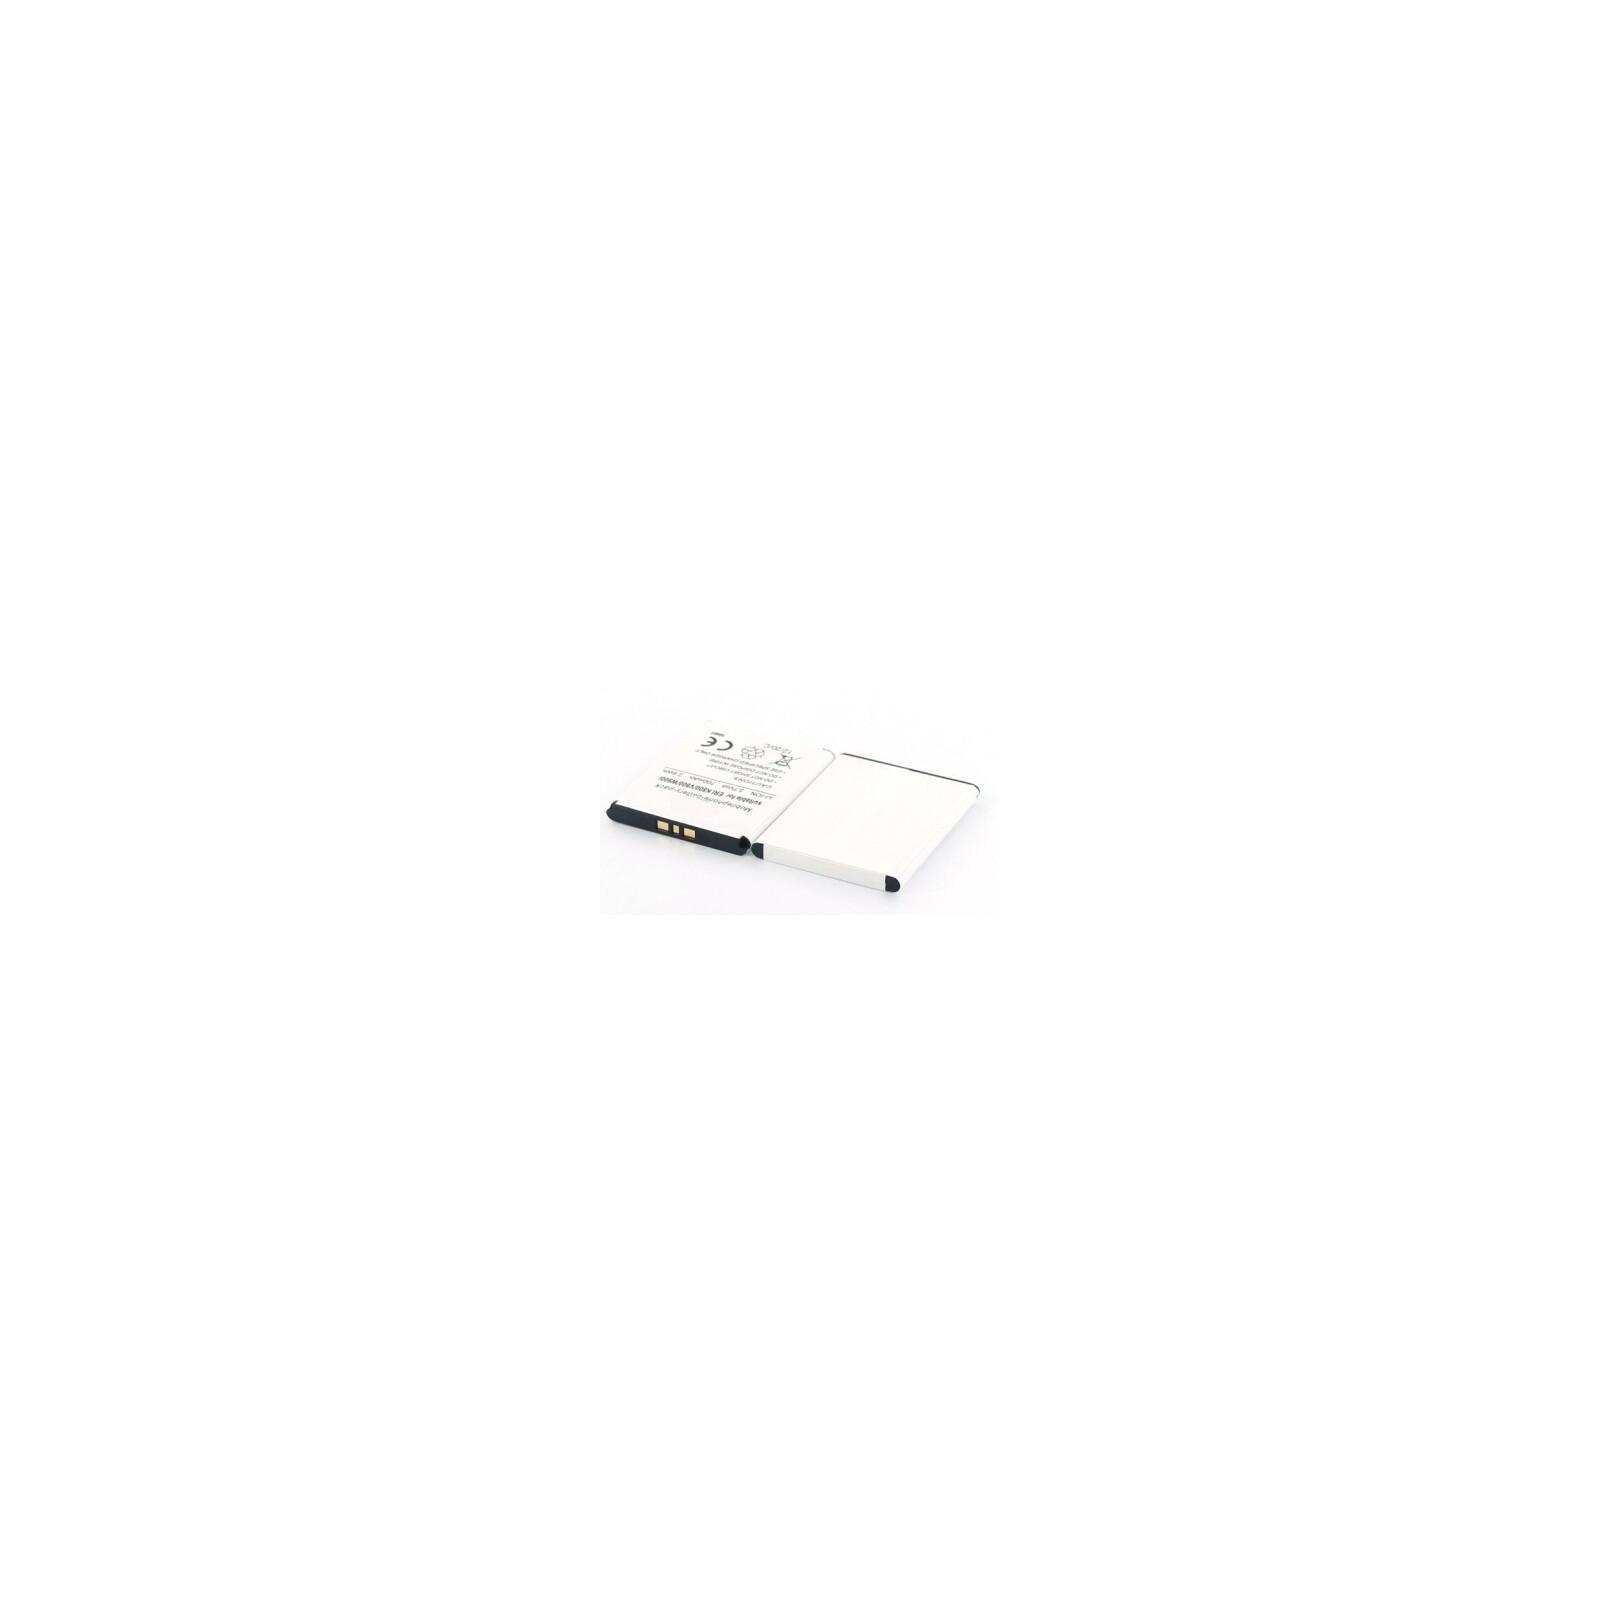 AGI Akku Sony Ericsson W880I 860mAh